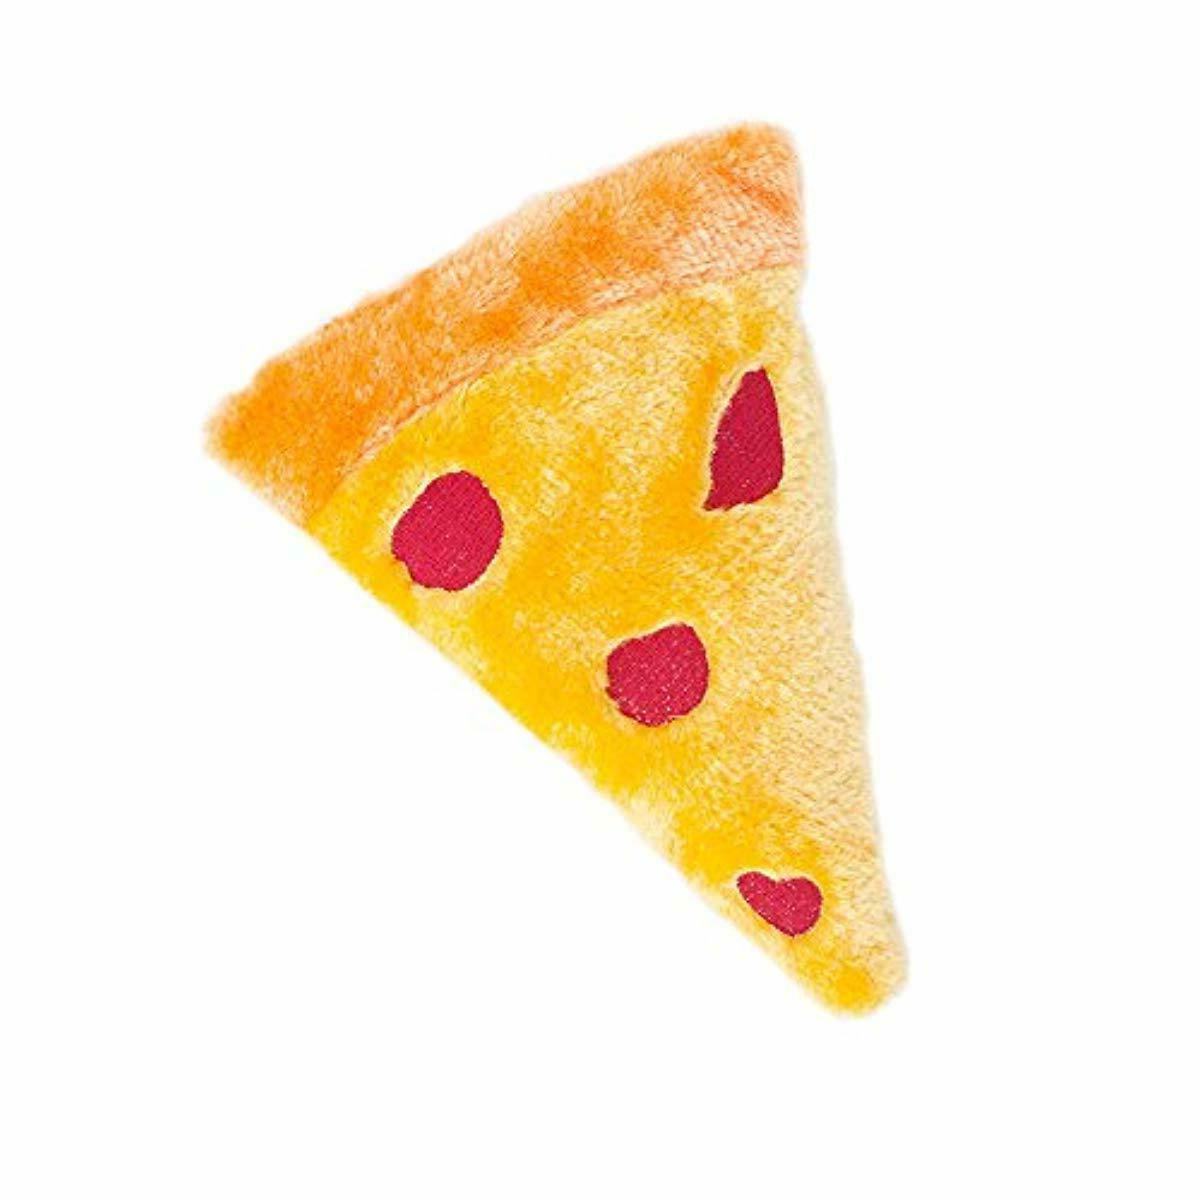 squeakie emojiz squeaky plush dog toy pizza